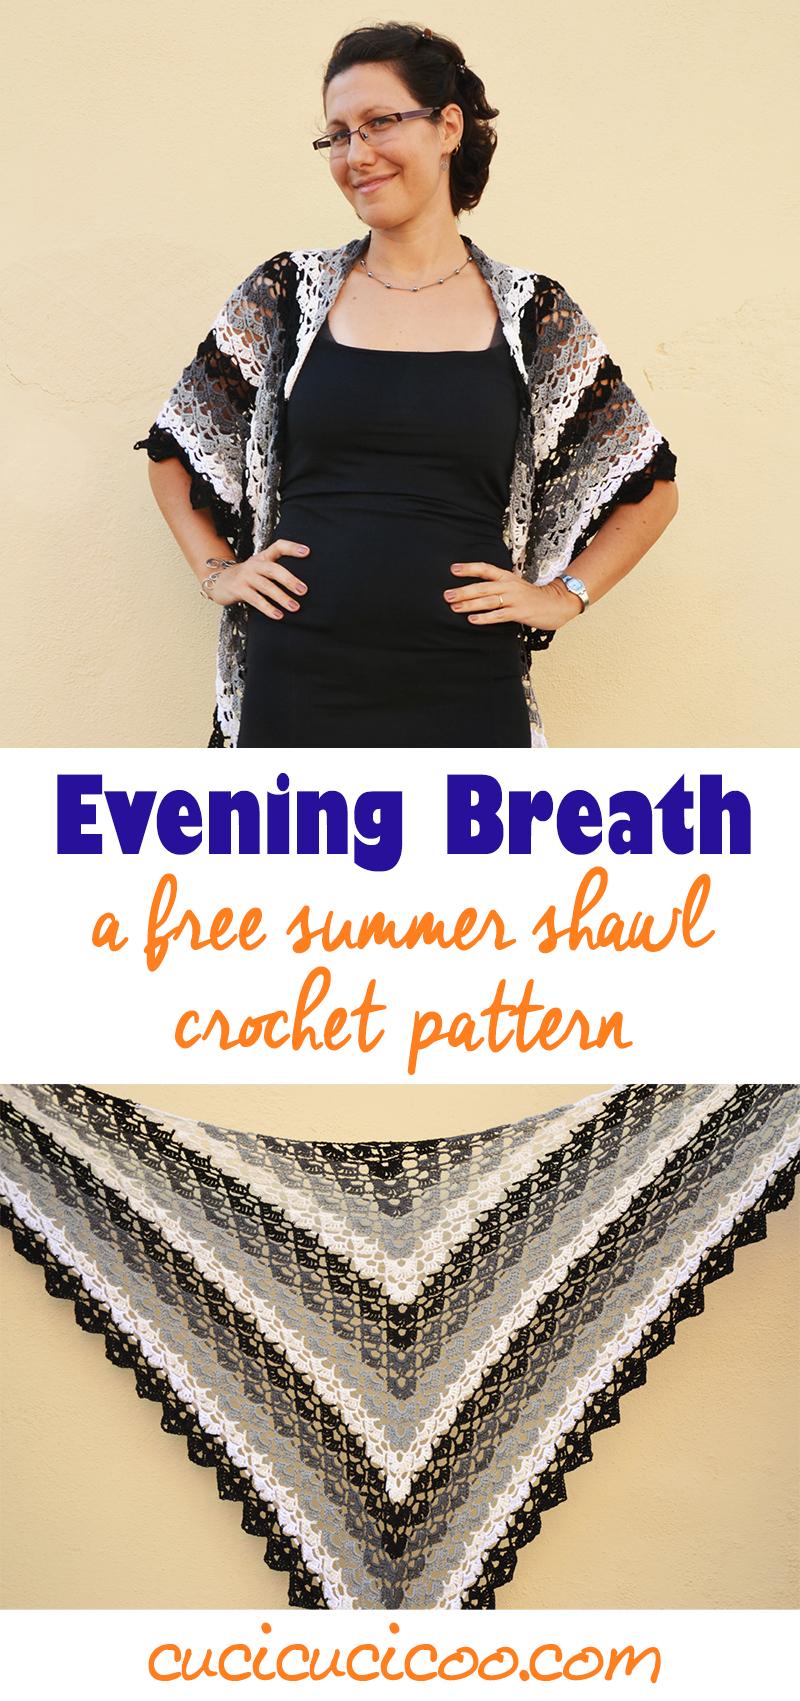 Evening Breath: free summer shawl crochet pattern - Cucicucicoo